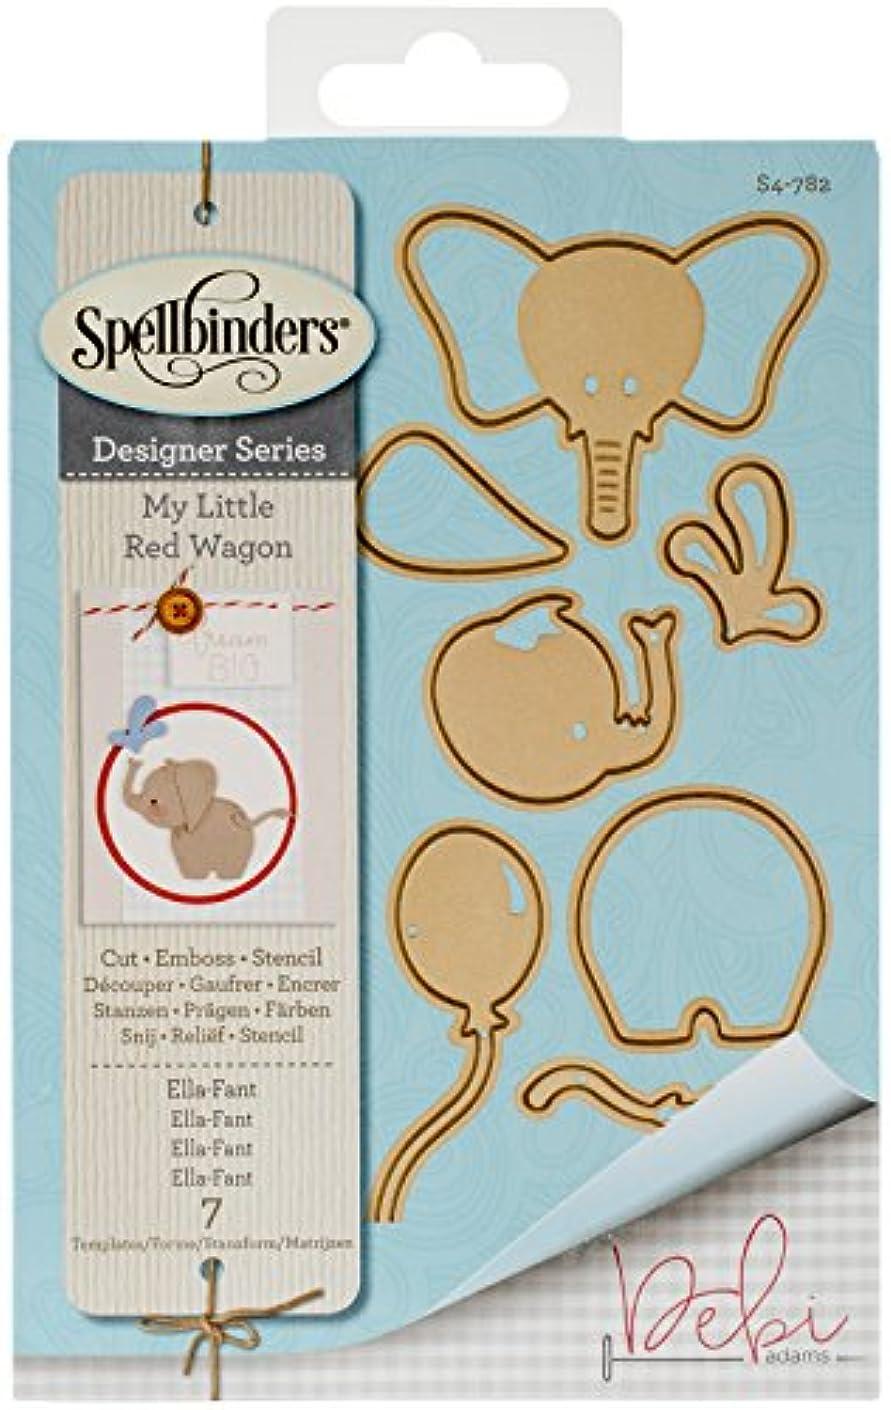 Spellbinders Shapeabilities Ella-Fant Etched/Wafer Thin Dies